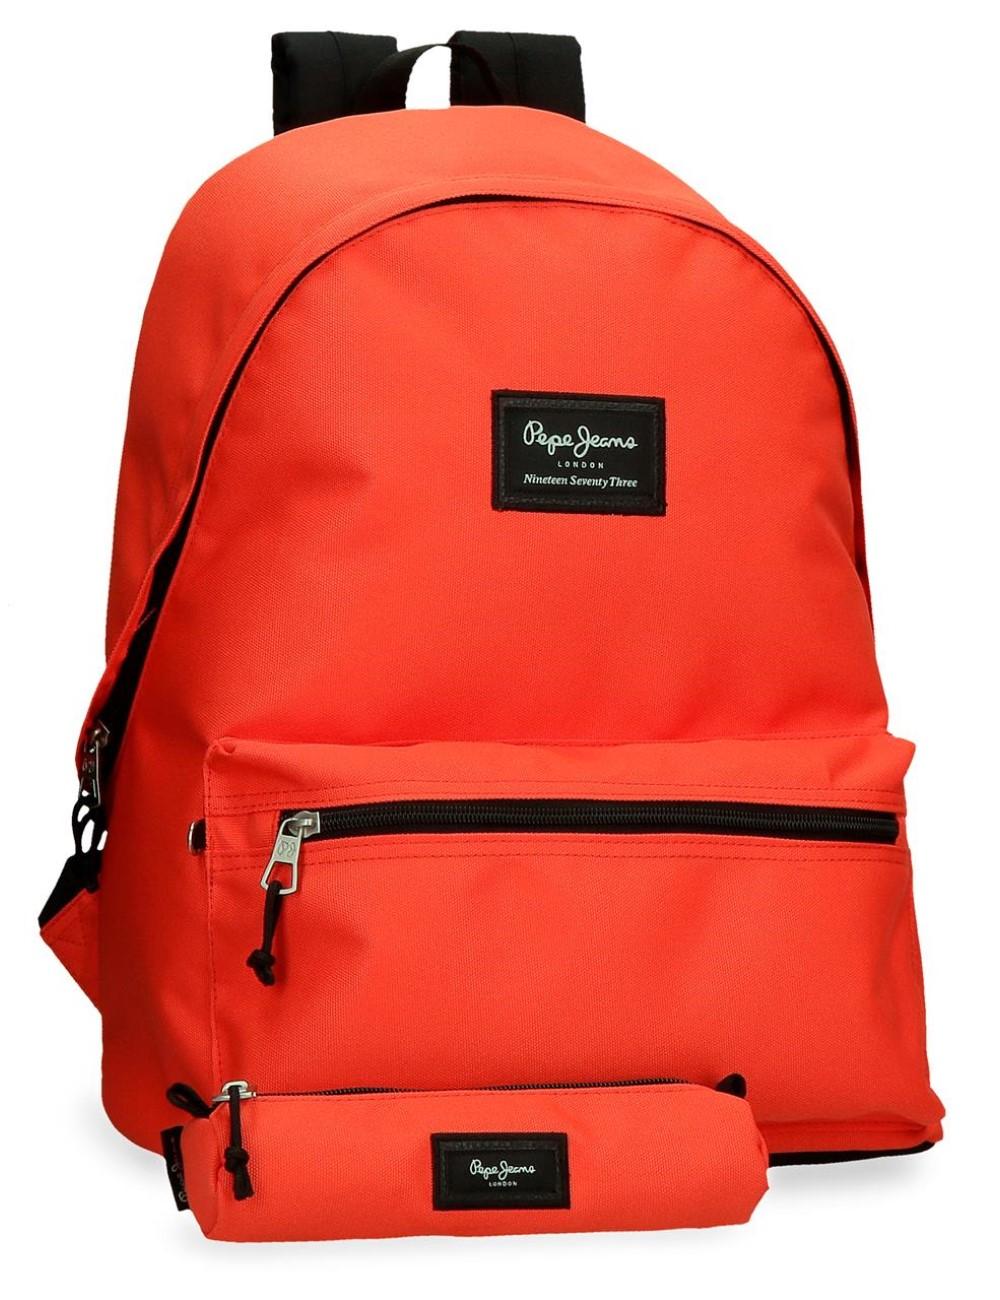 Mochila Un Compartimento Portaordenador + Portatodo Pepe Jeans Colorful Naranja 6329222